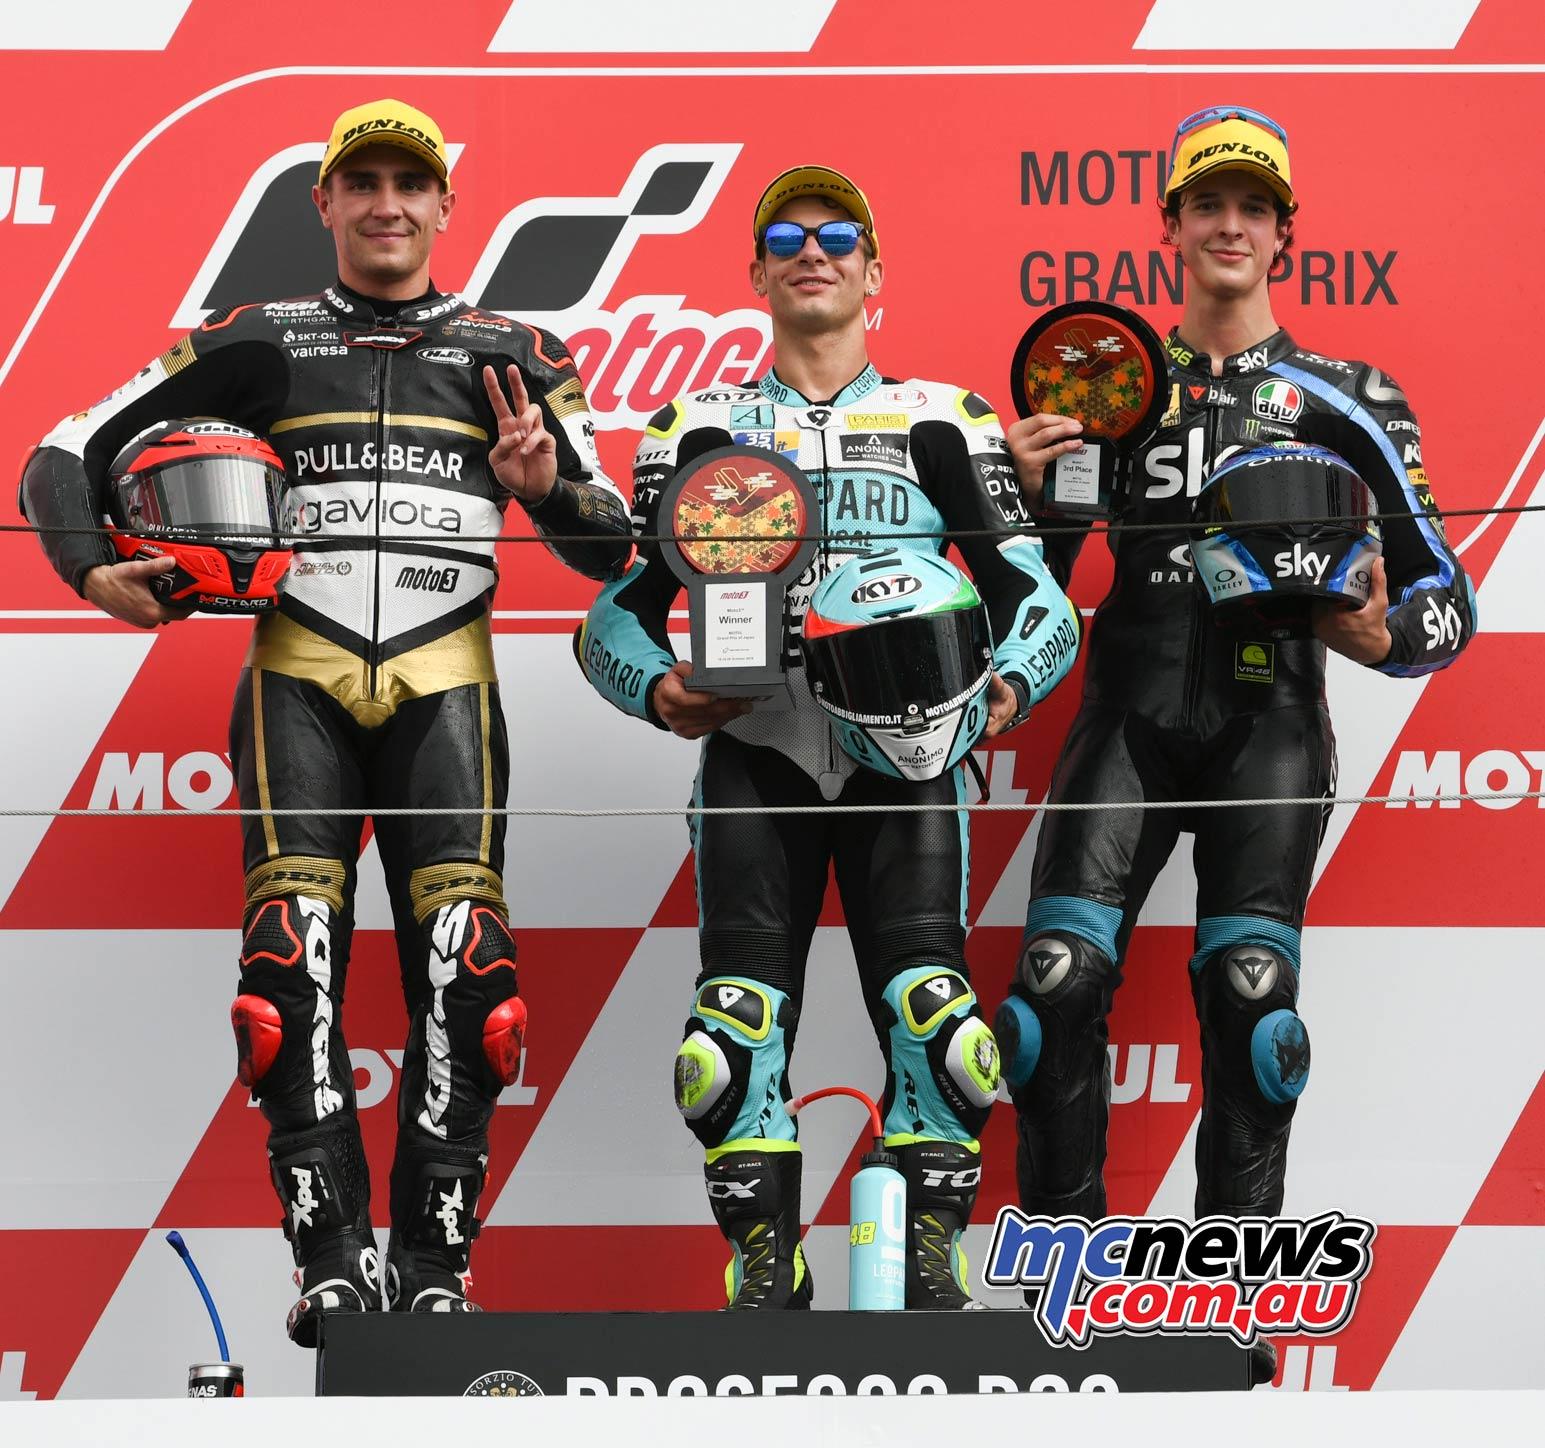 MotoGP Motegi Race Moto DallaPorta Podium